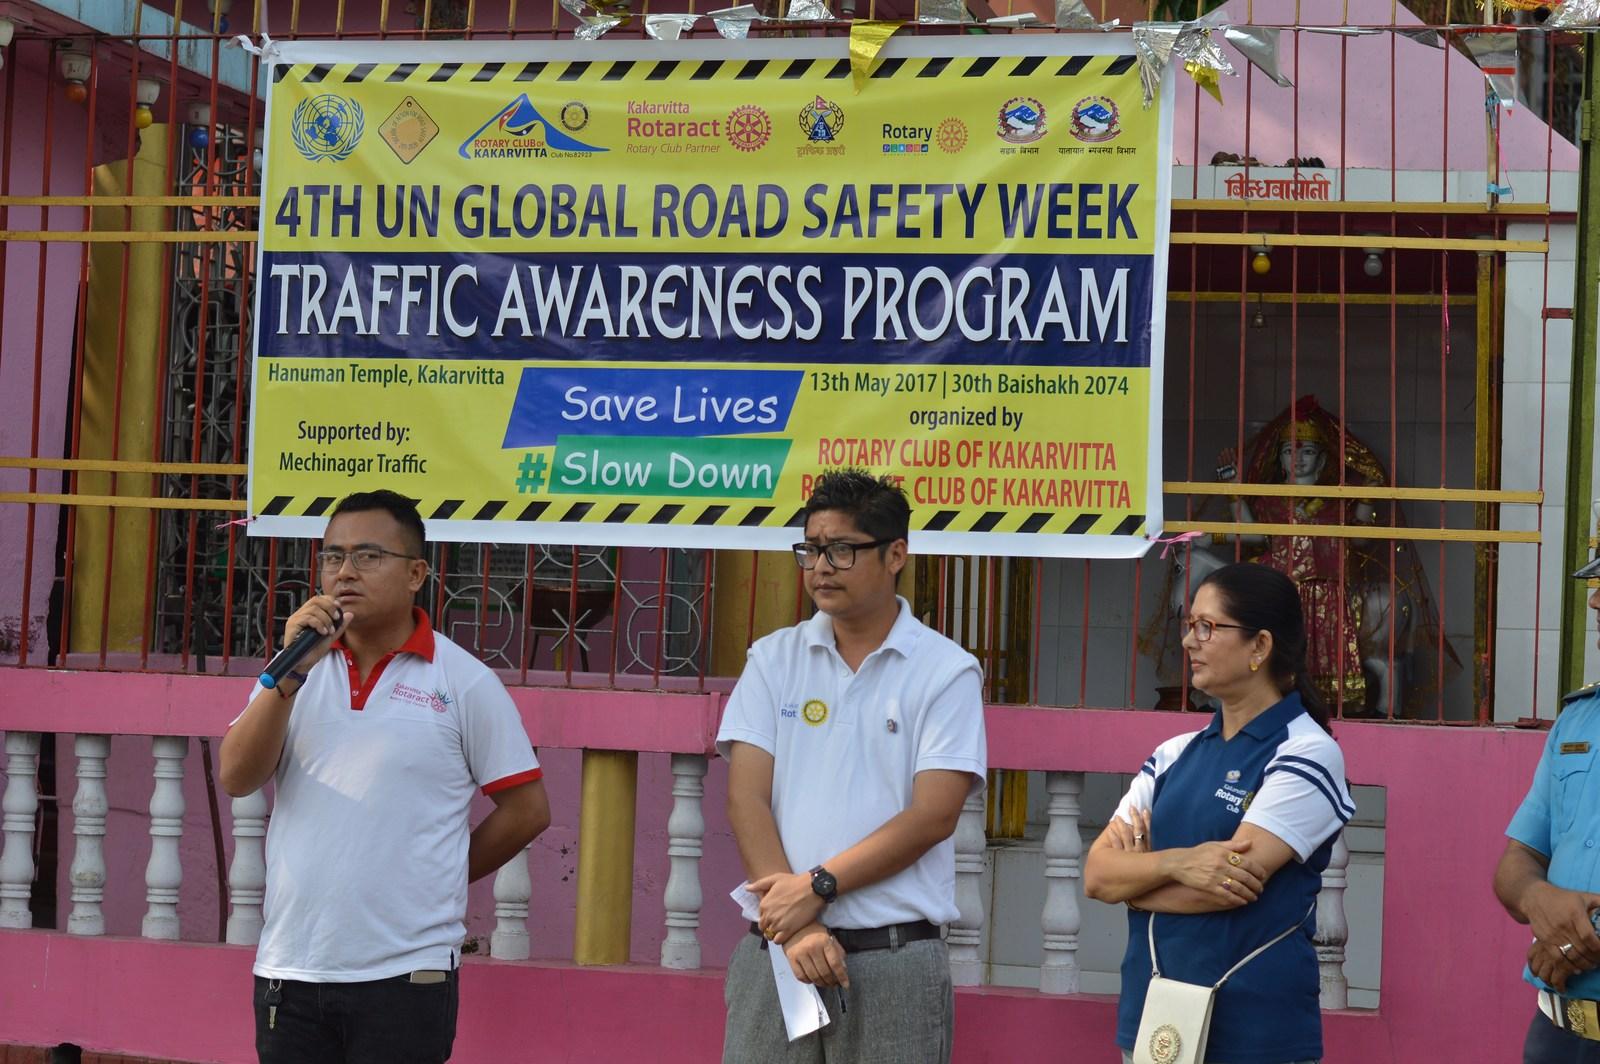 4th-UN-Global-Road-Safety-Week-2017-Traffic-Awareness-Program-Rotary-club-of-Kakarvitta-11